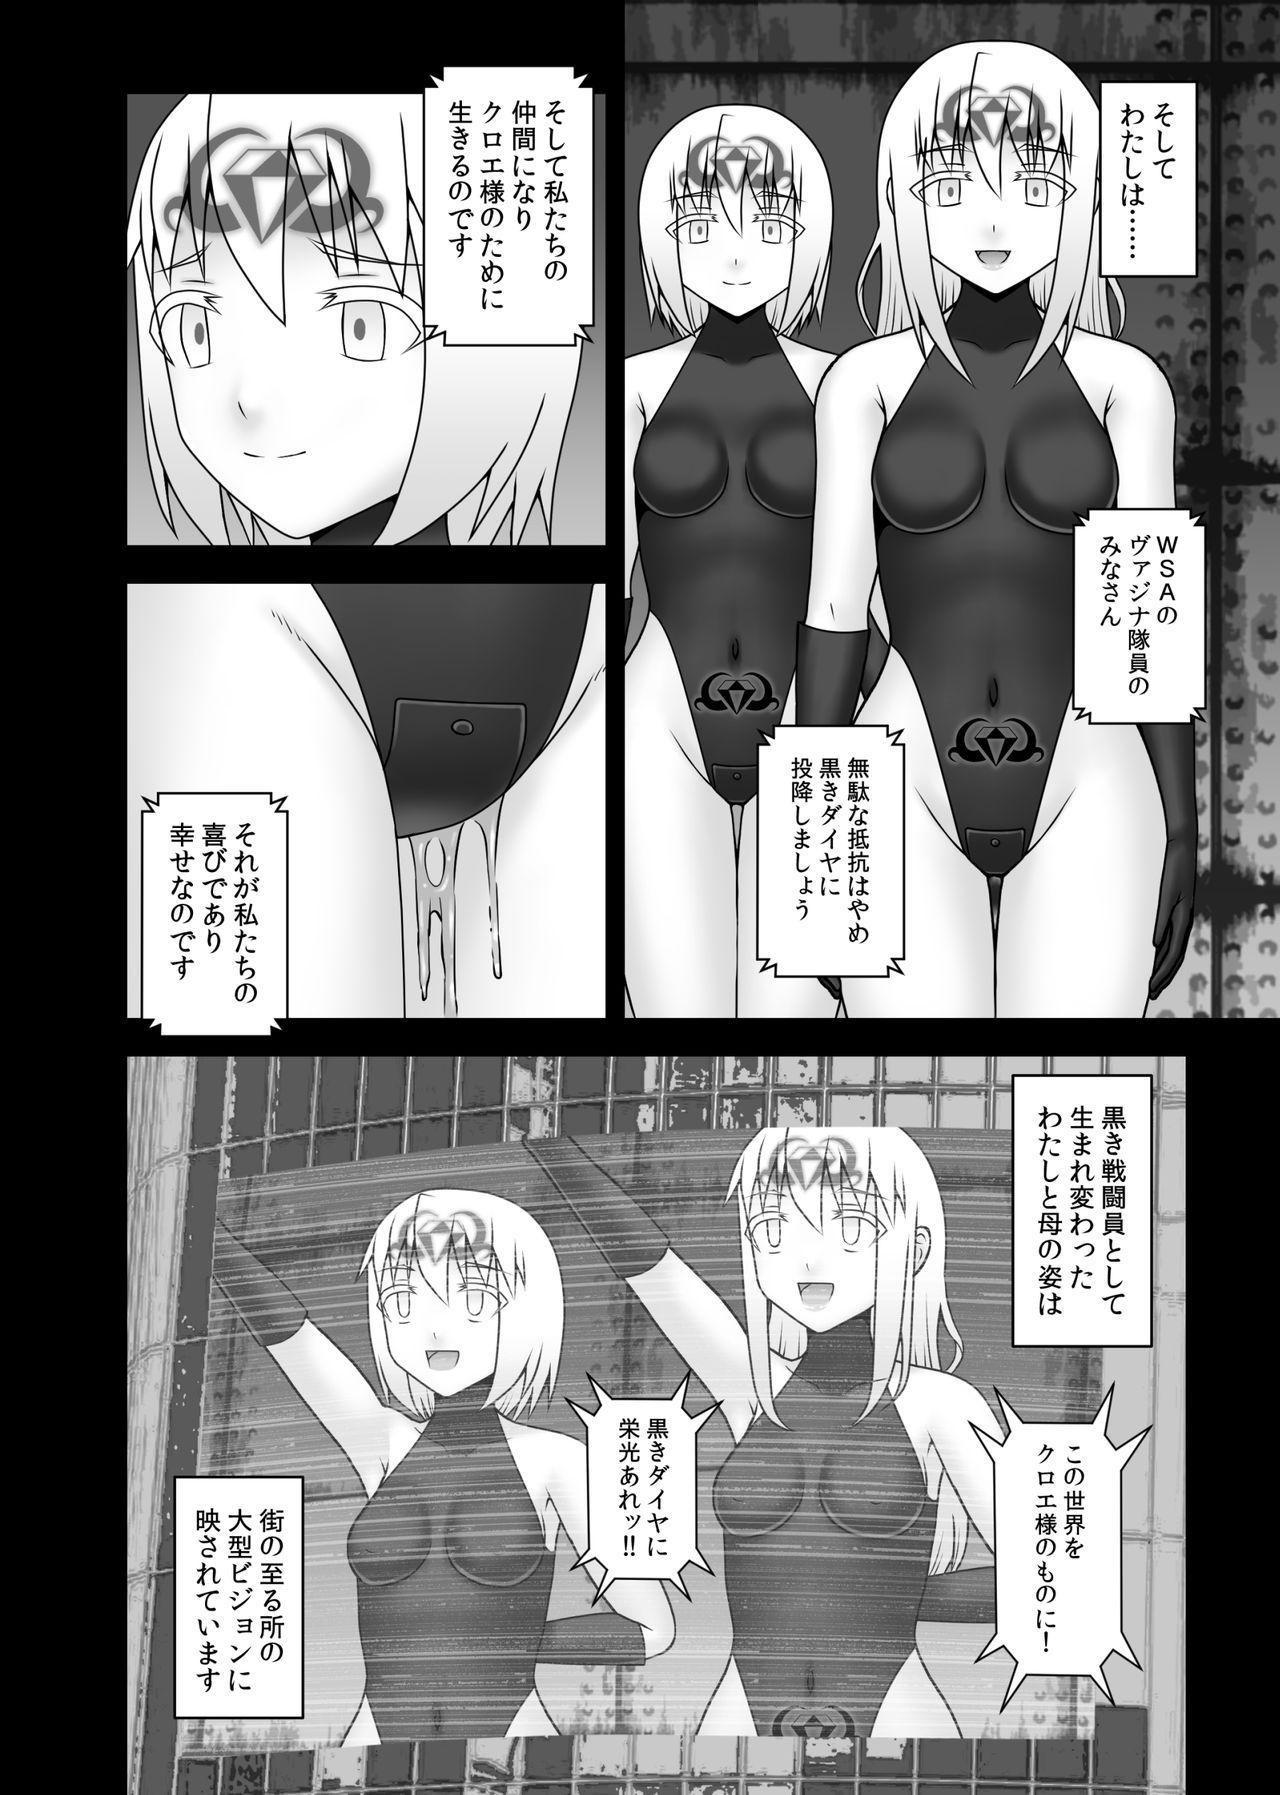 Teisou Sentai Virginal Colors Saishuuwa 44